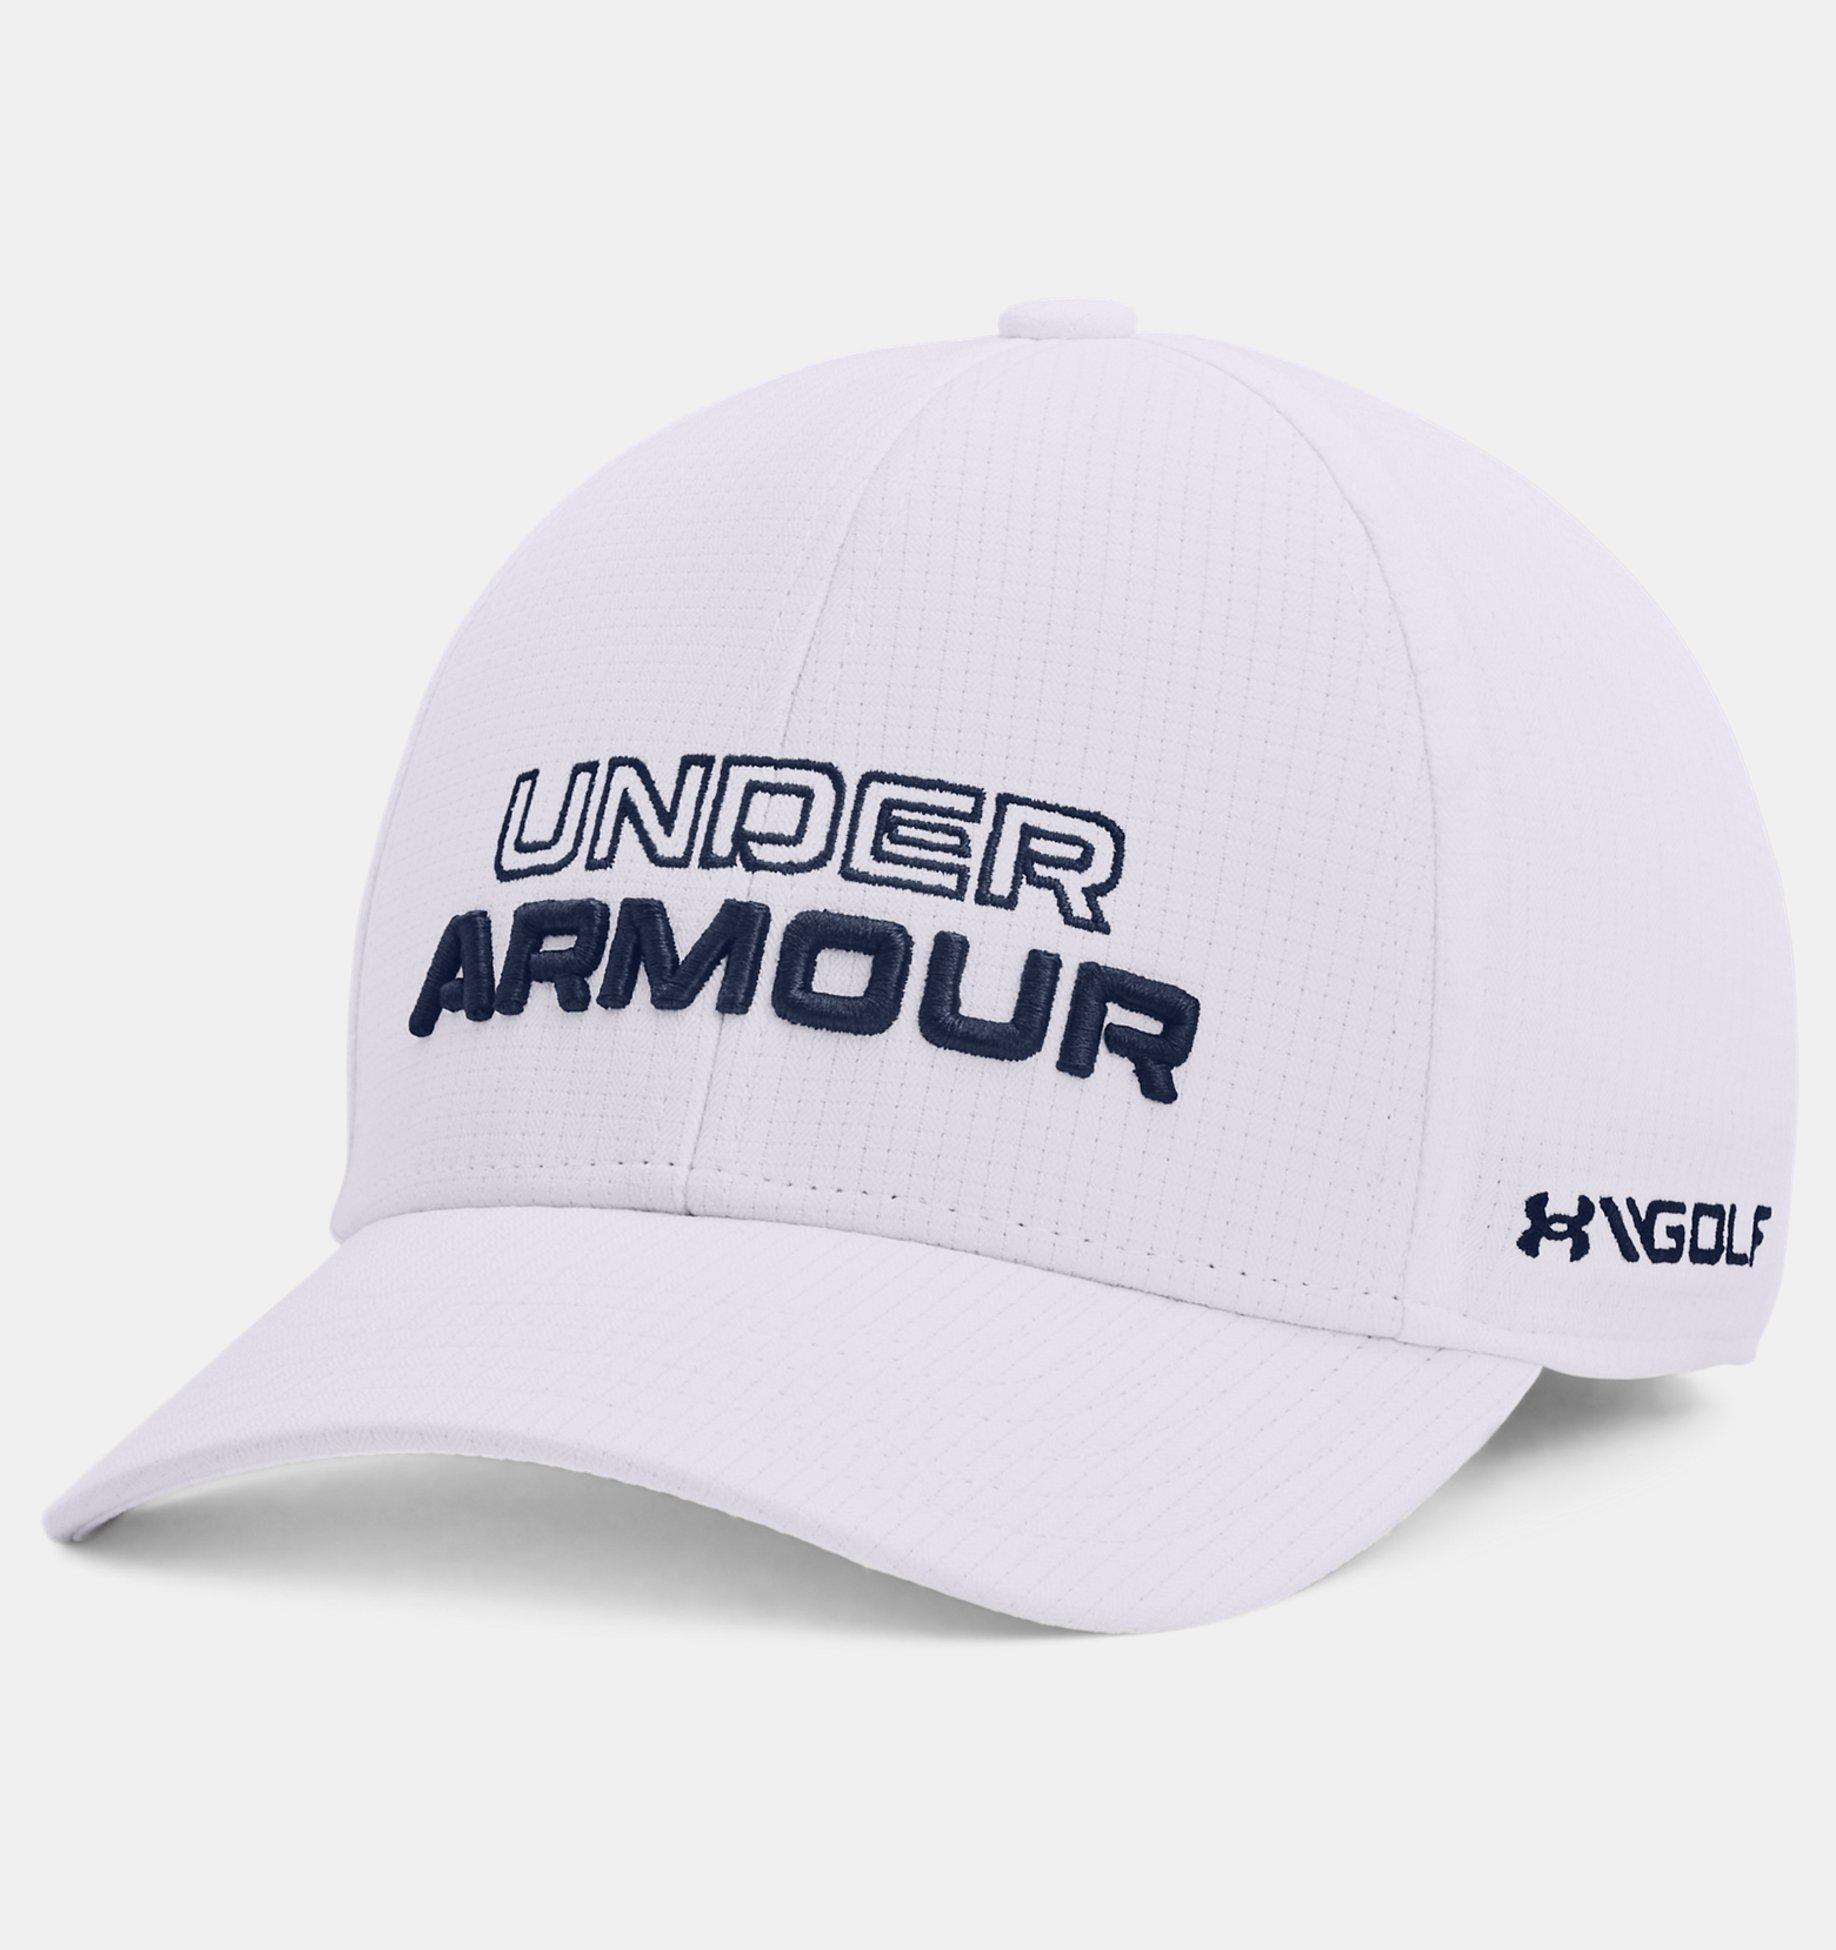 Underarmour Boys UA Jordan Spieth Tour Hat